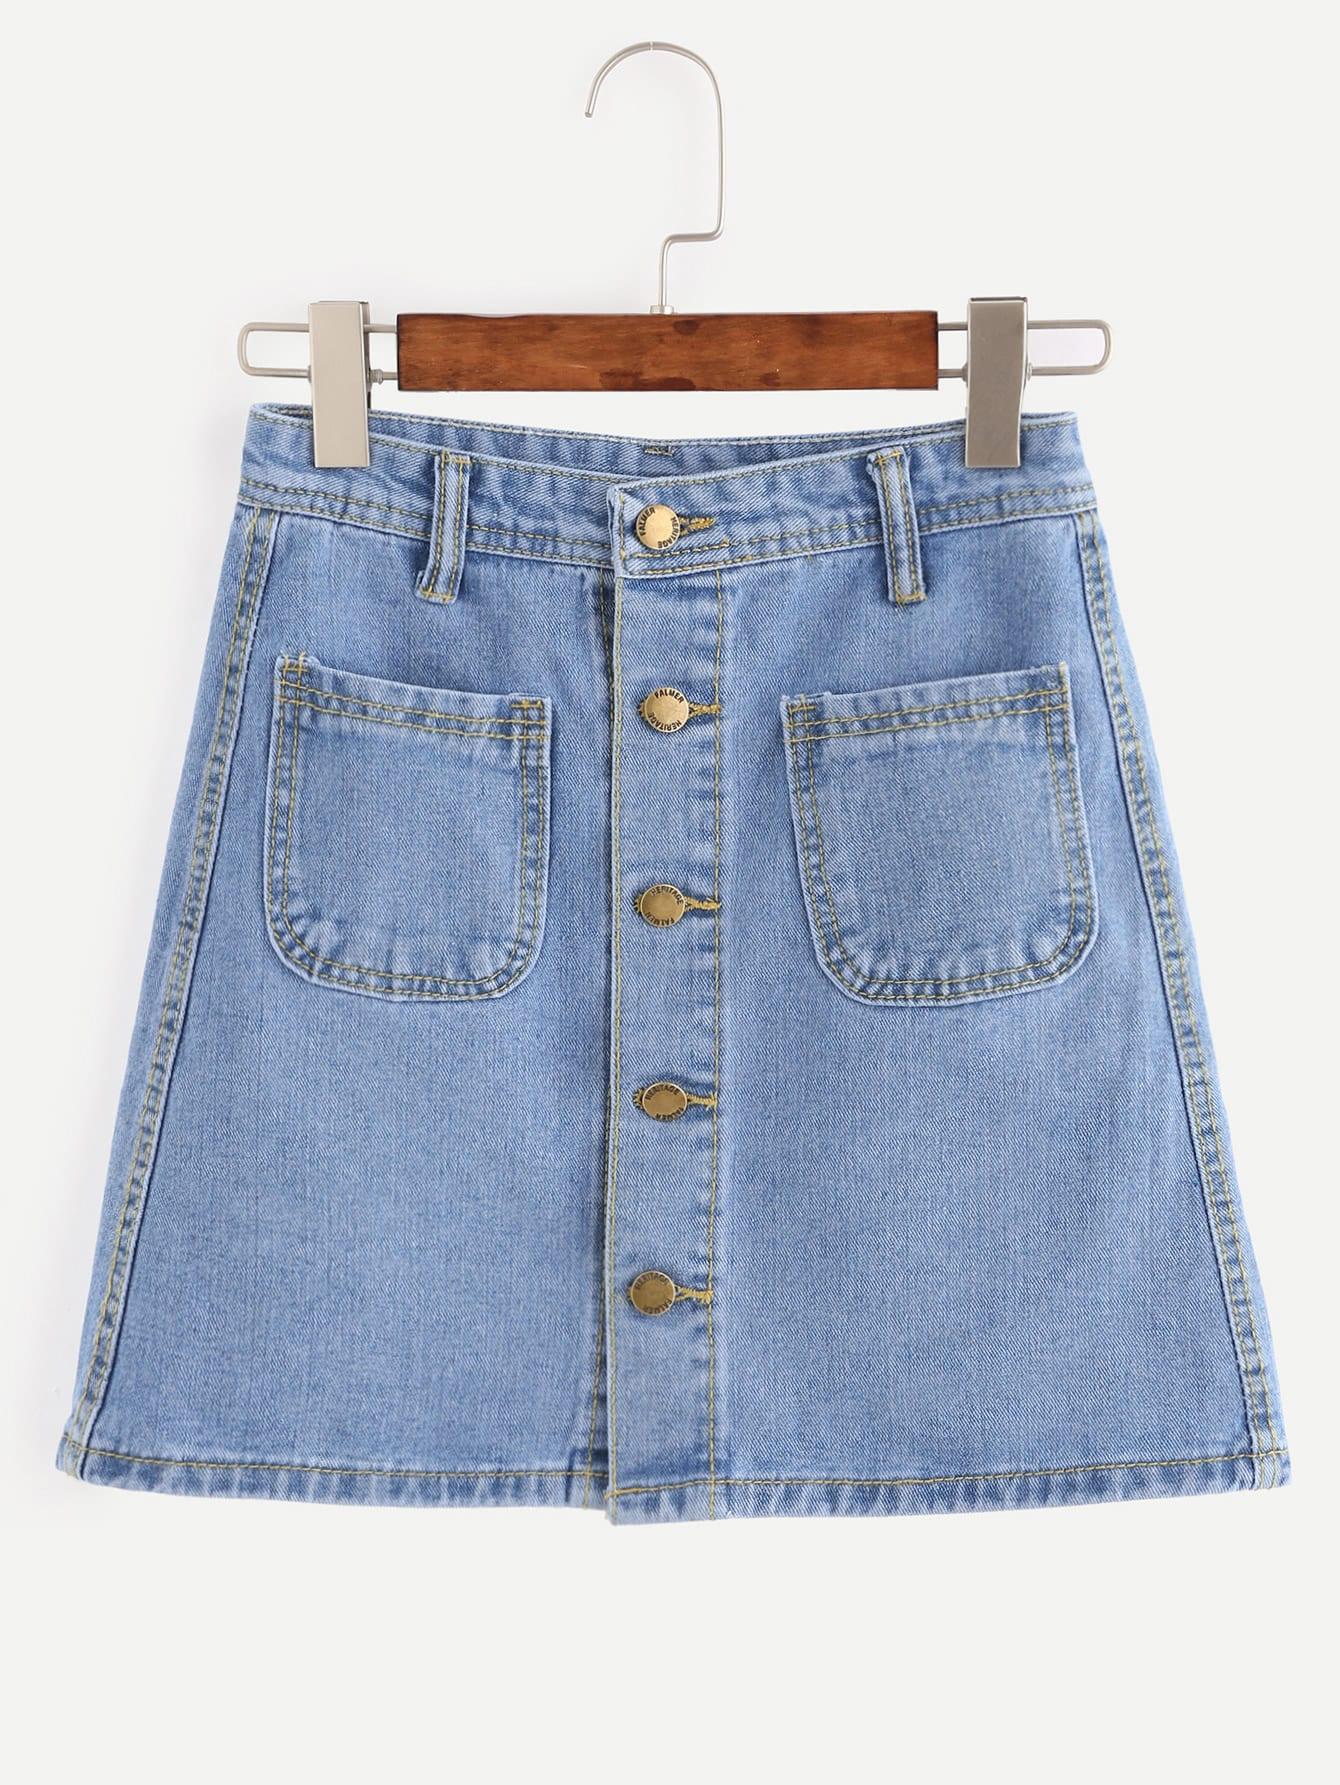 c6957f958b5d2 The Best Denim Skirts, 2018 Denim Skirts Trends: Latest Fashion & In ...